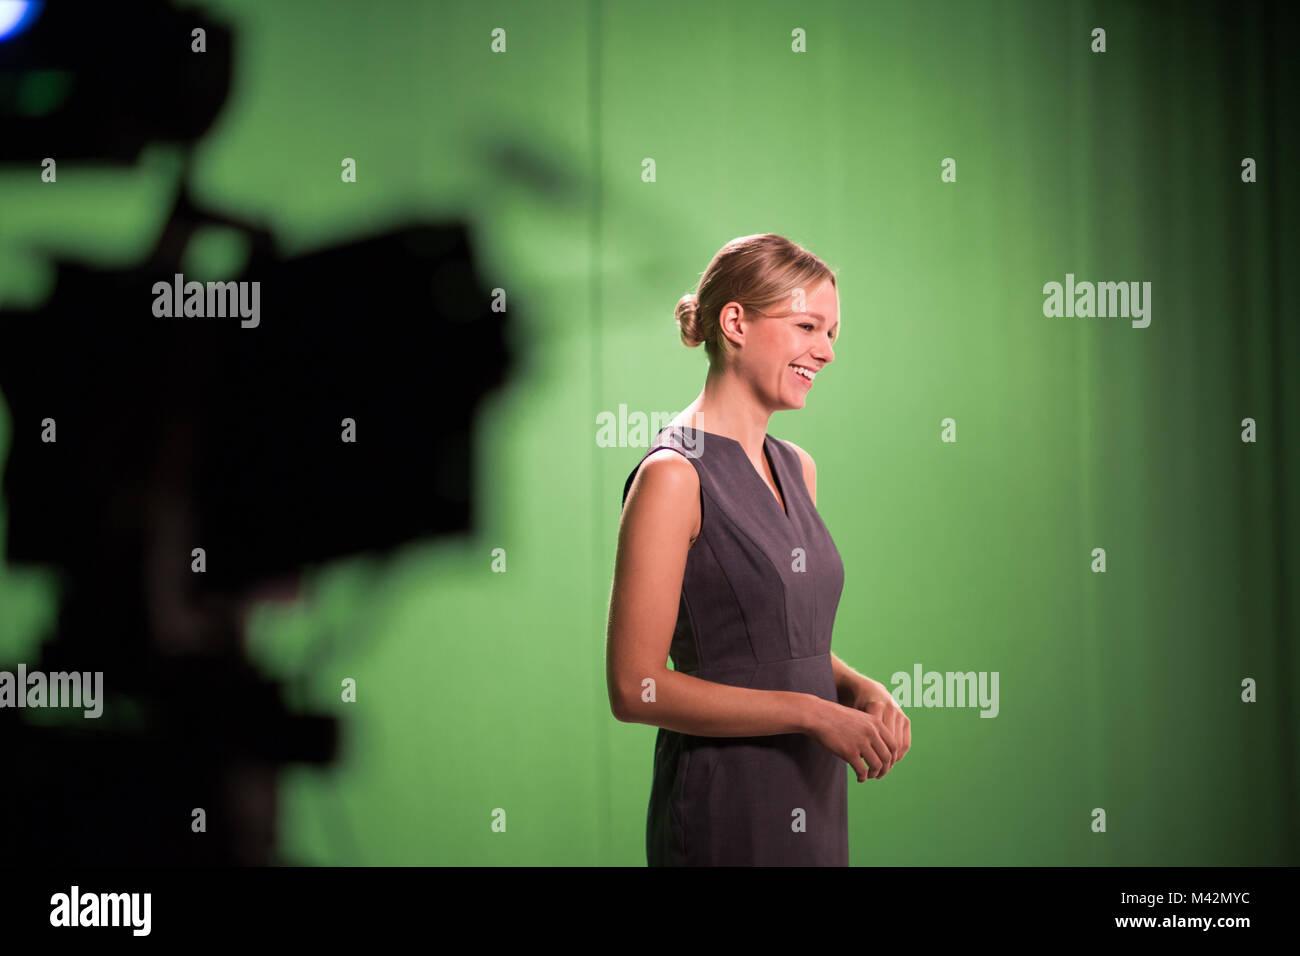 Presenter standing in a green screen studio - Stock Image